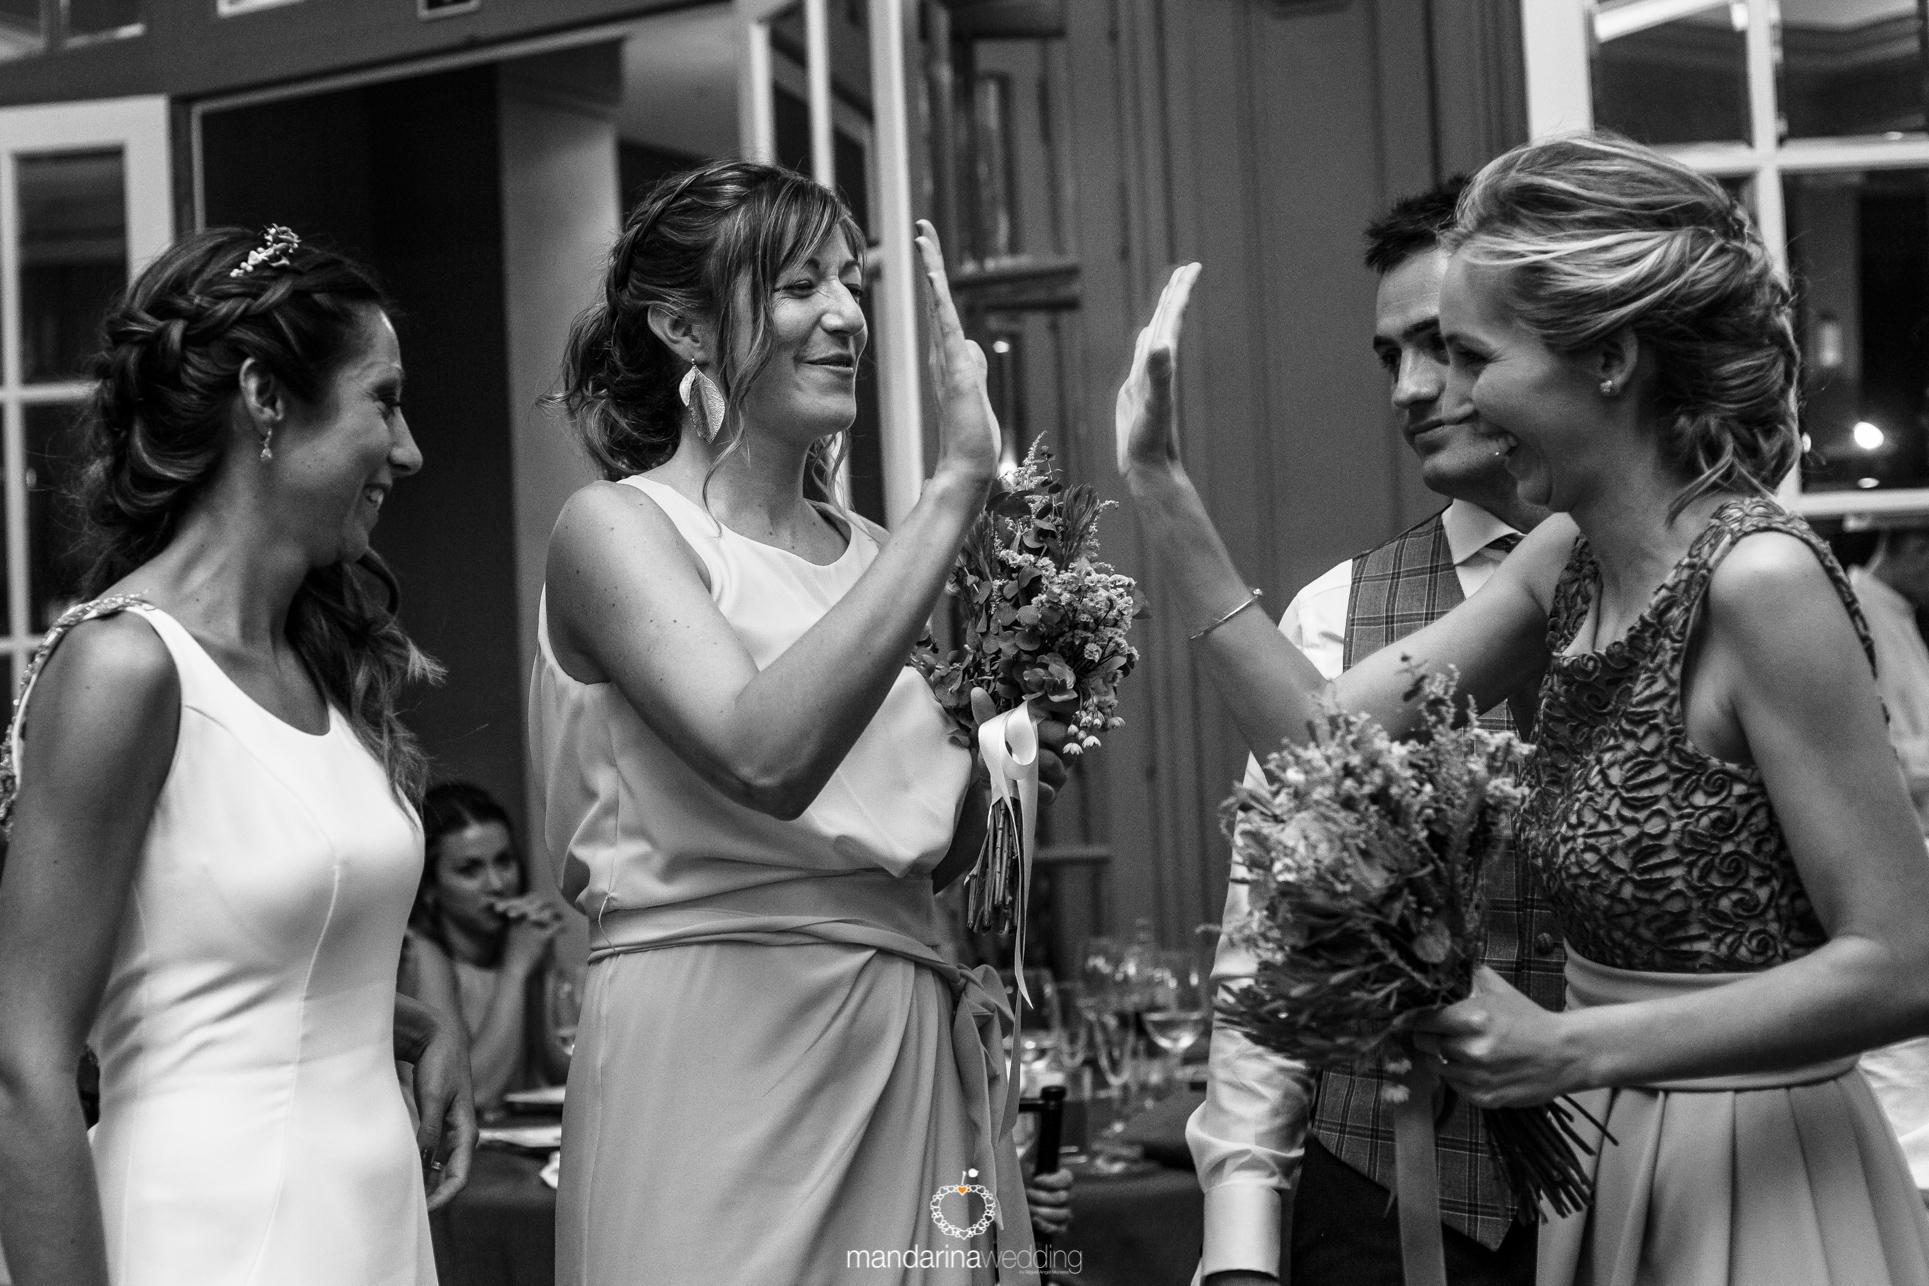 mandarina wedding, fotografo boda pais vasco, fotografo boda zaragoza, fotógrafo boda soria, fotografo boda Madrid, fotógrafo boda tarragona-20